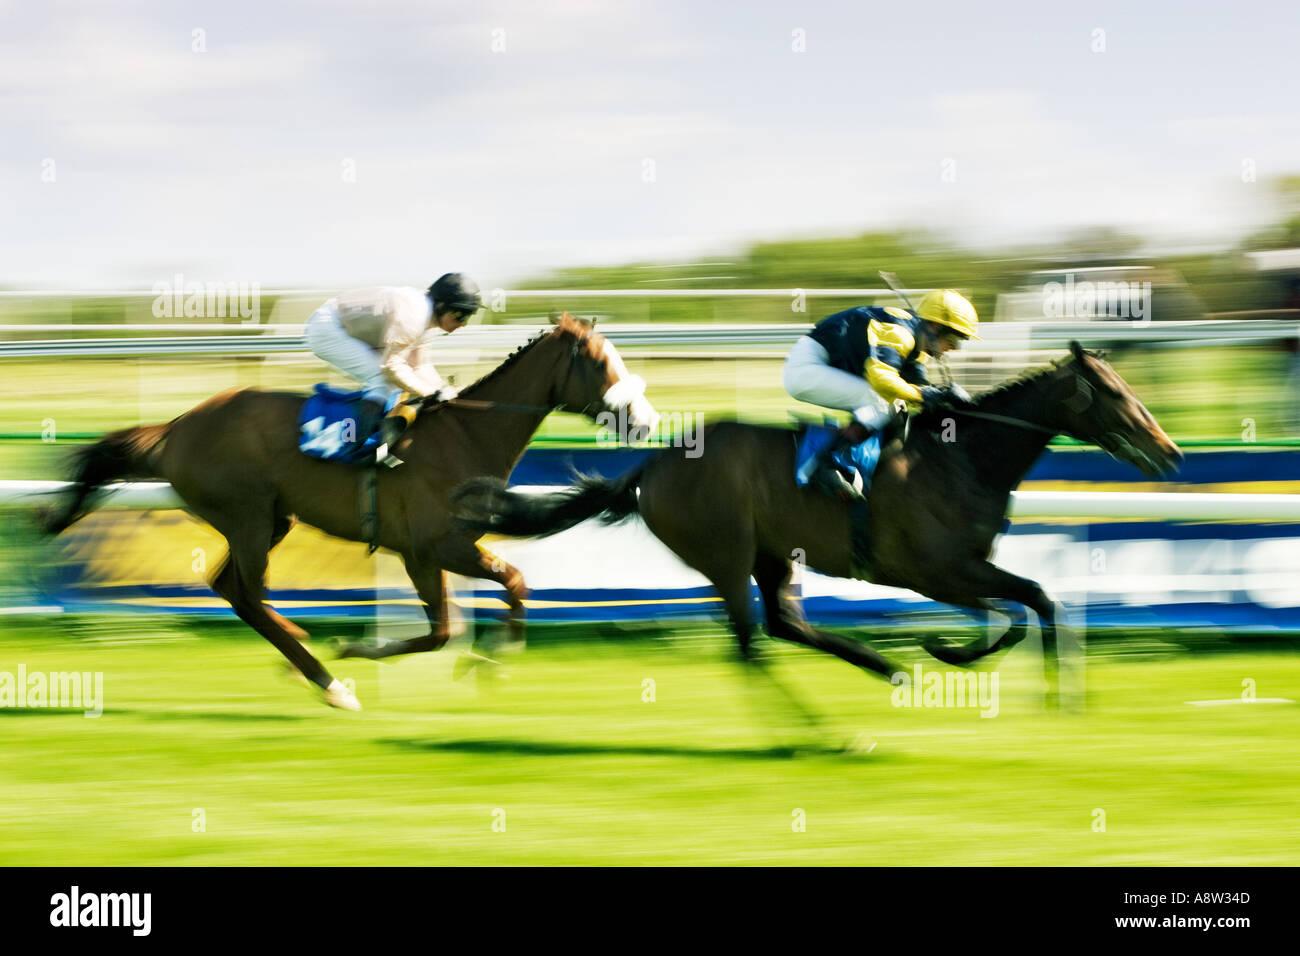 Carreras de Caballos - En la carrera a la línea de meta. Imagen De Stock